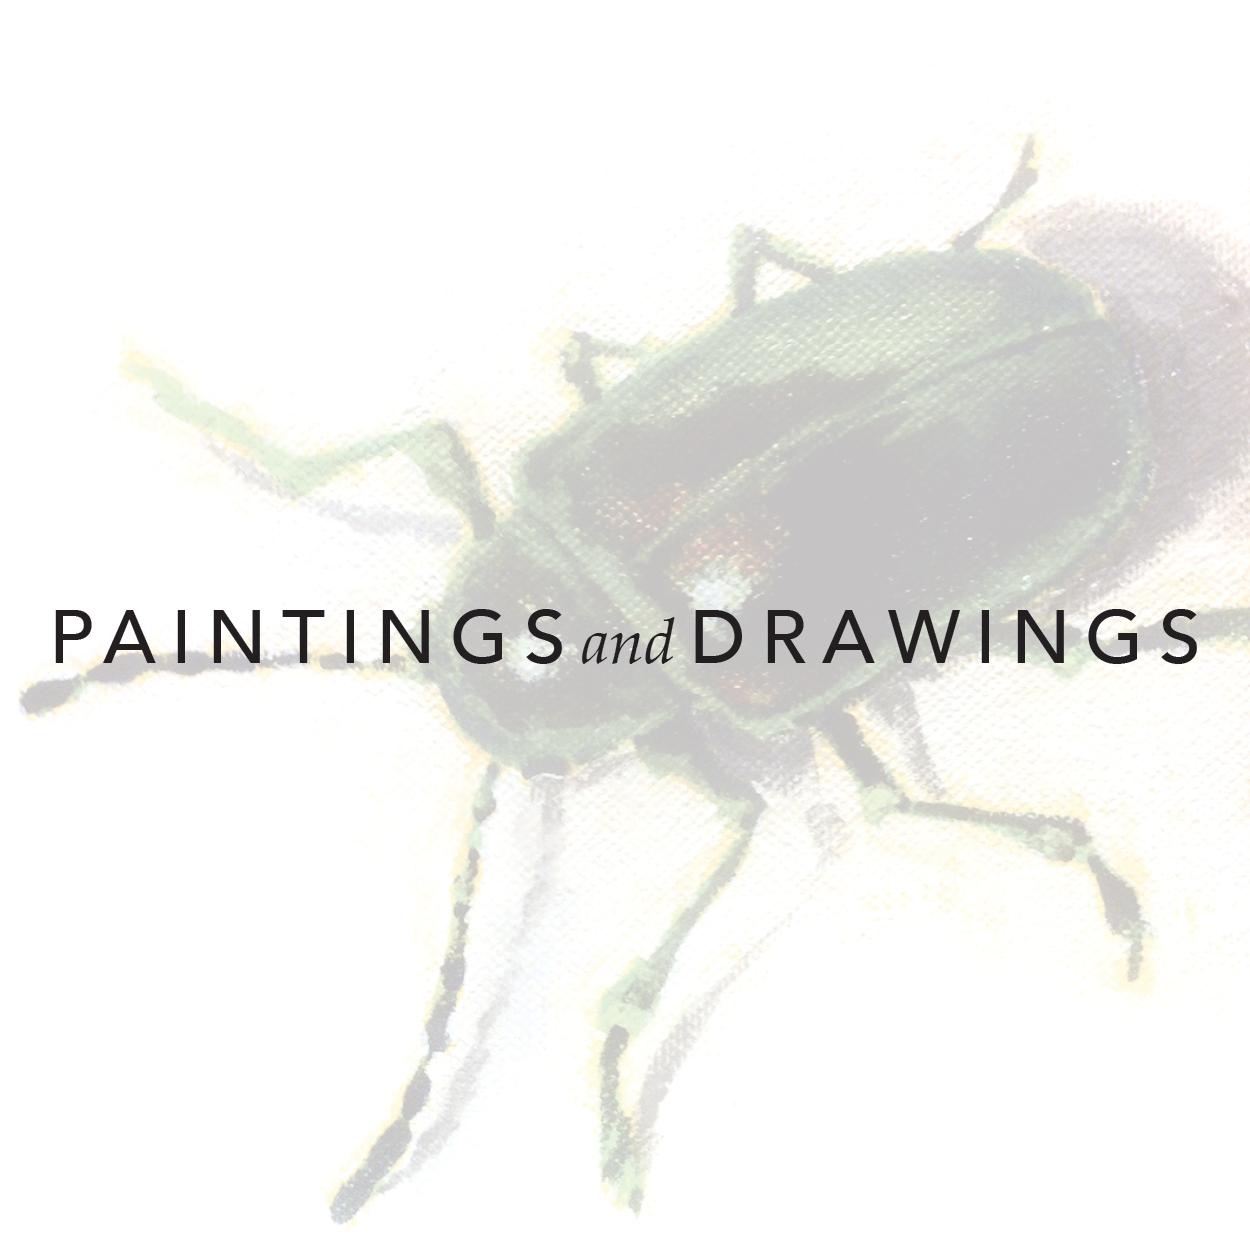 Painting_titlecard_2018.jpg